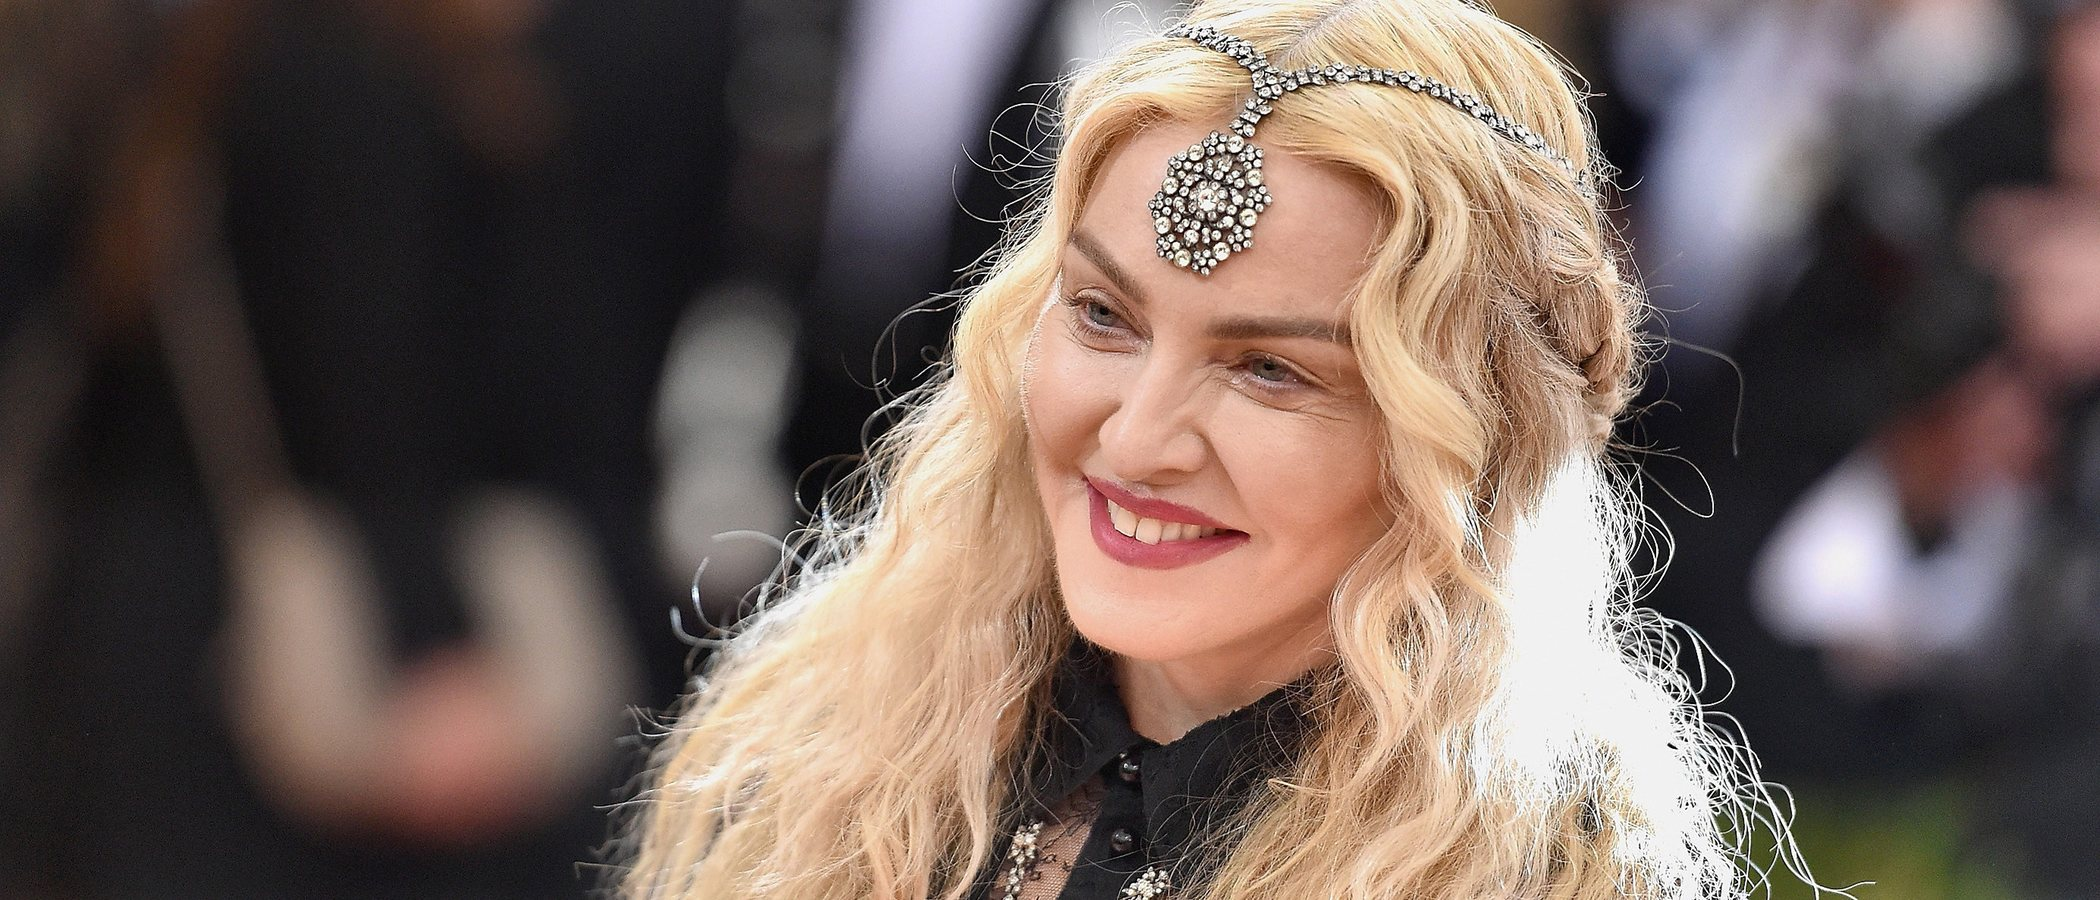 e135e7a441 El estilo de Madonna en 10 momentos clave: Así se convirtió en un icono de